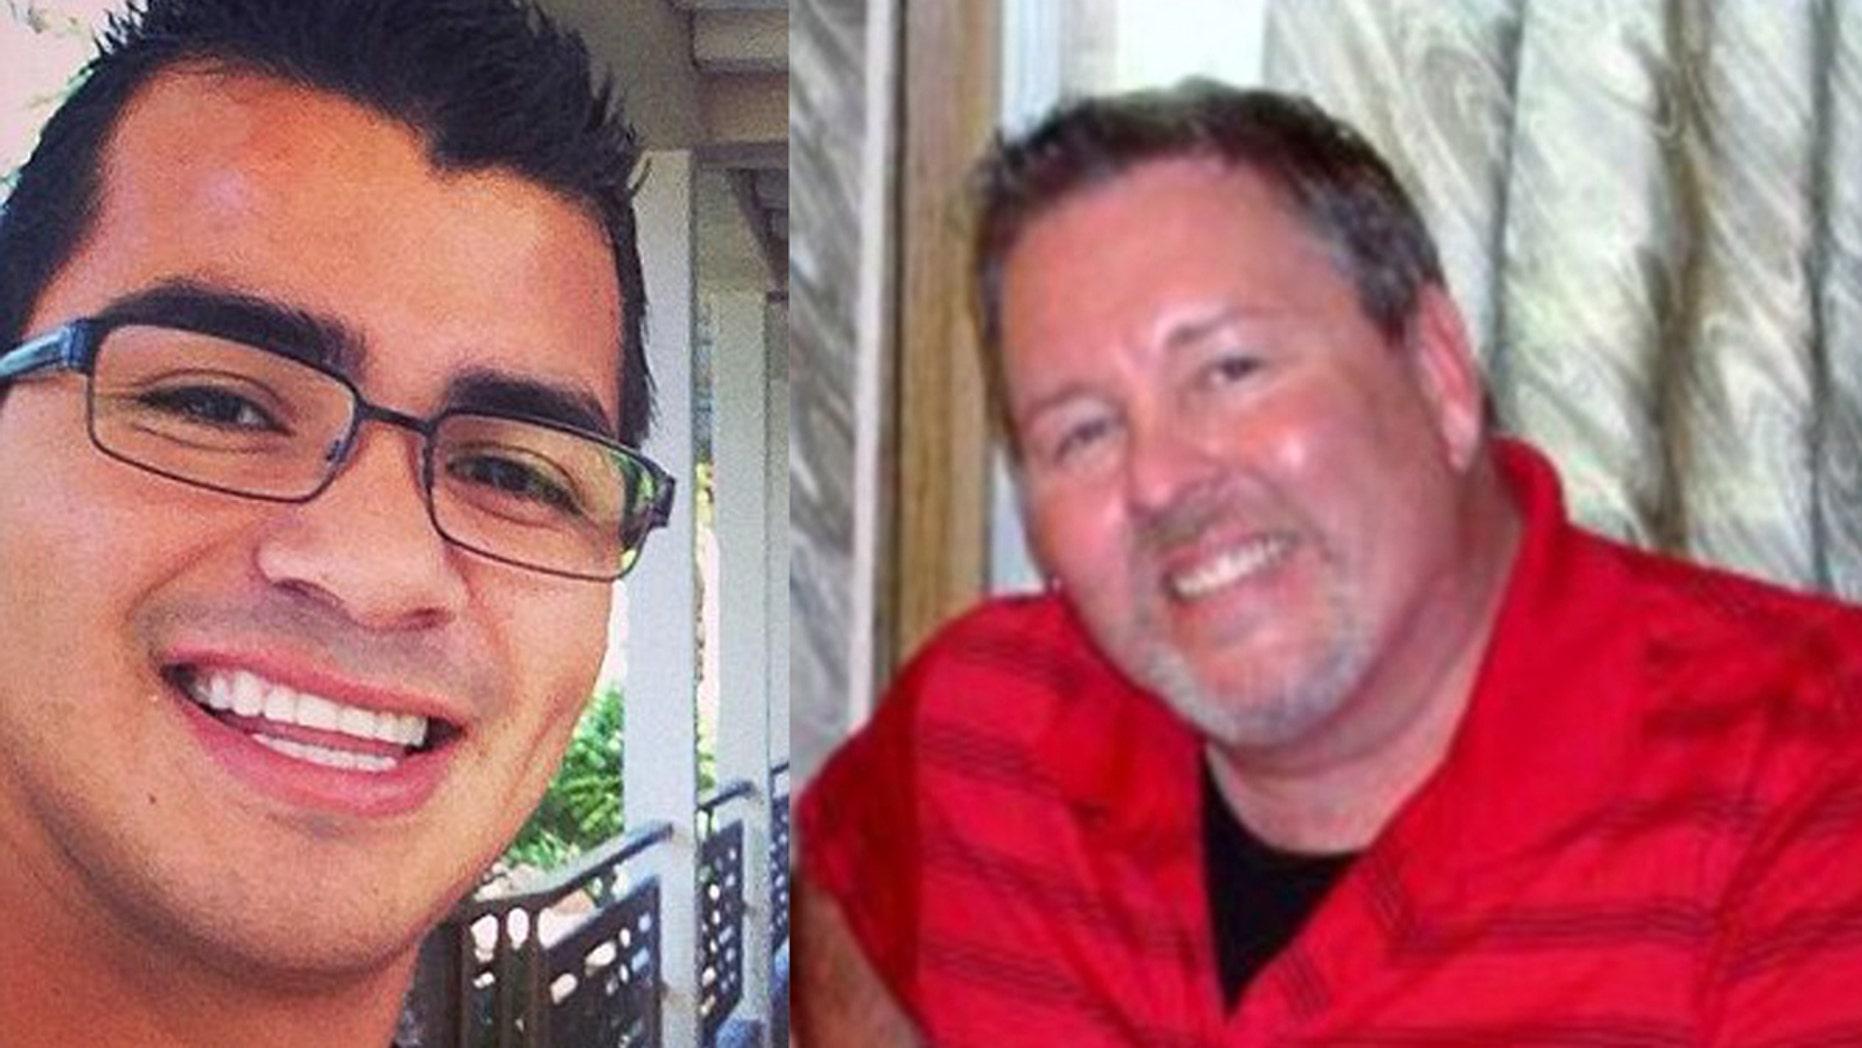 David Meza, left, was sentenced for murdering his boyfriend Jake Merendino, right.